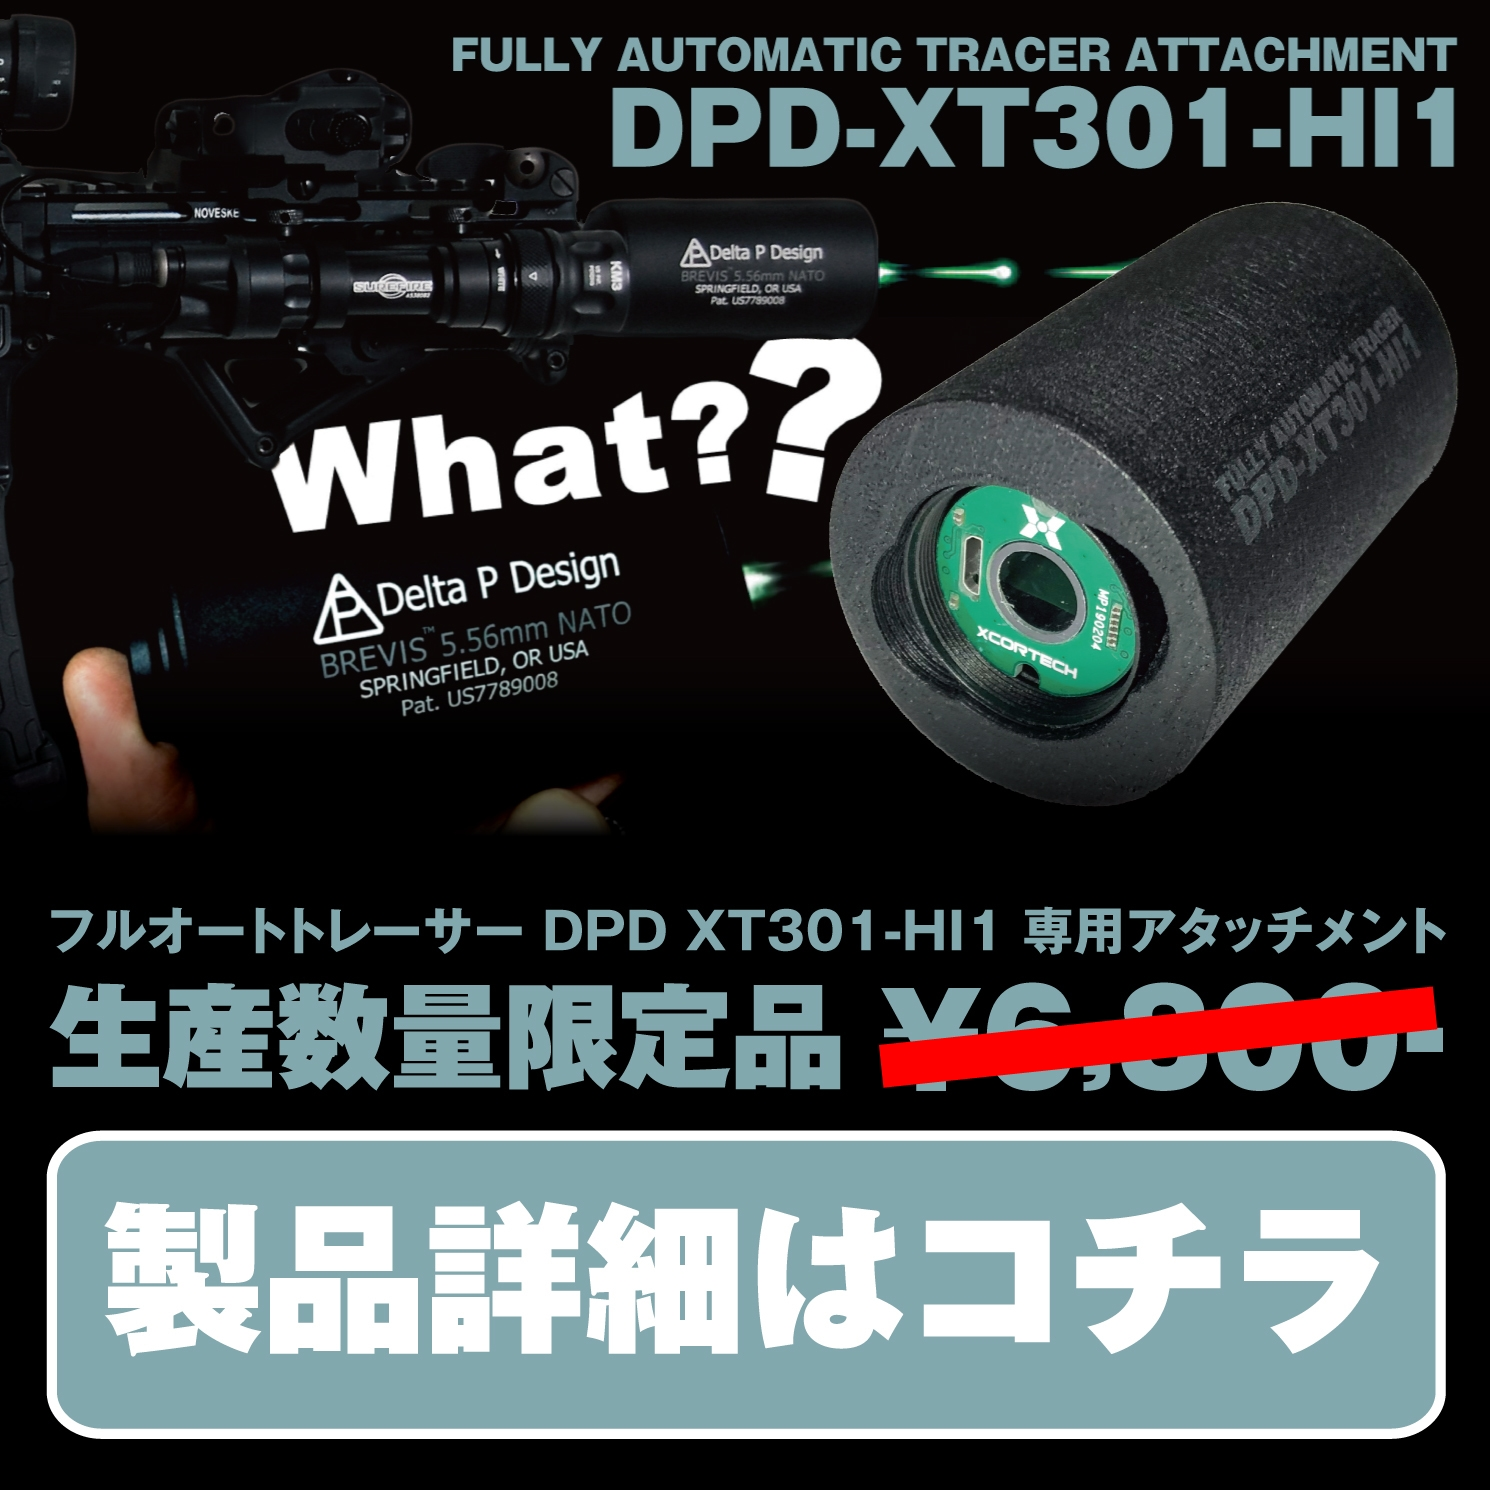 『DPD XT301 HI1』 MADBULL Delta P Design & XCORTECH XT301 UV ウルトラコンパクト フルオート トレーサー 専用アタッチメント!!